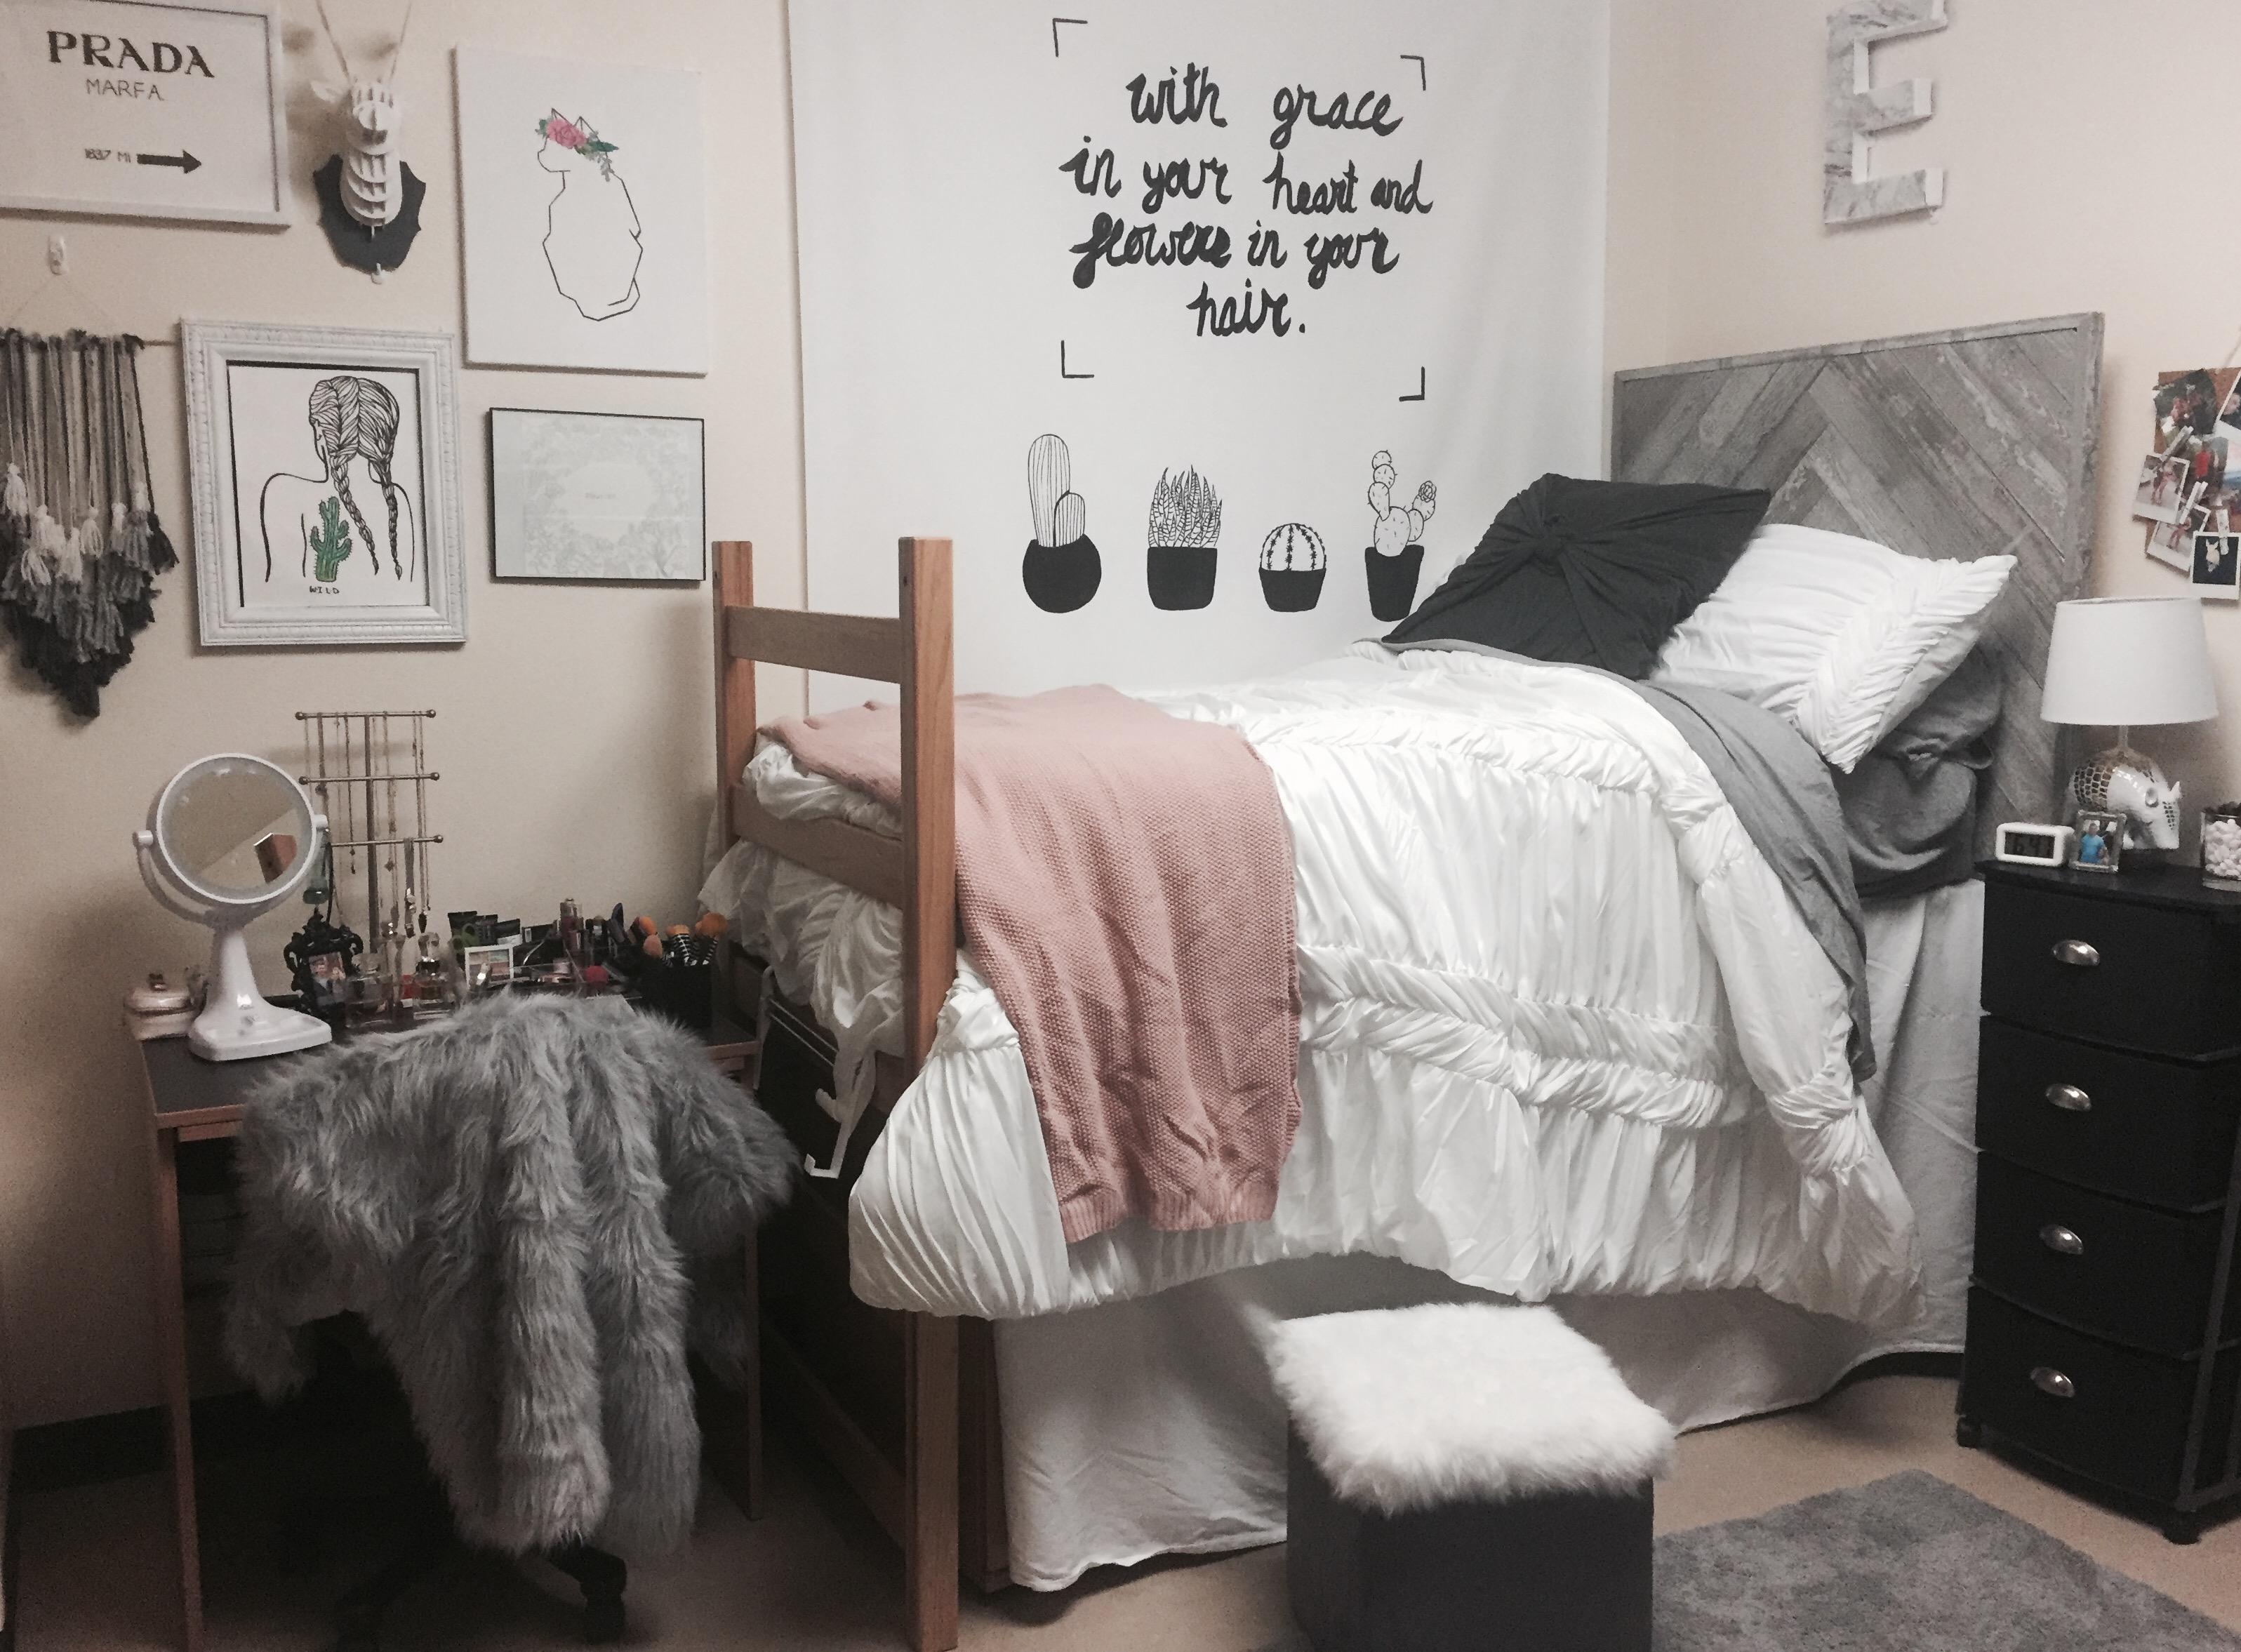 Cheerful College Dorm Room Ideas College Dorm Room Ideas Dorm Room Ideas To Make Your Space More Senior Dorm Room Decor Dorm Room Ideas Pinterest bedroom Dorm Room Stuff